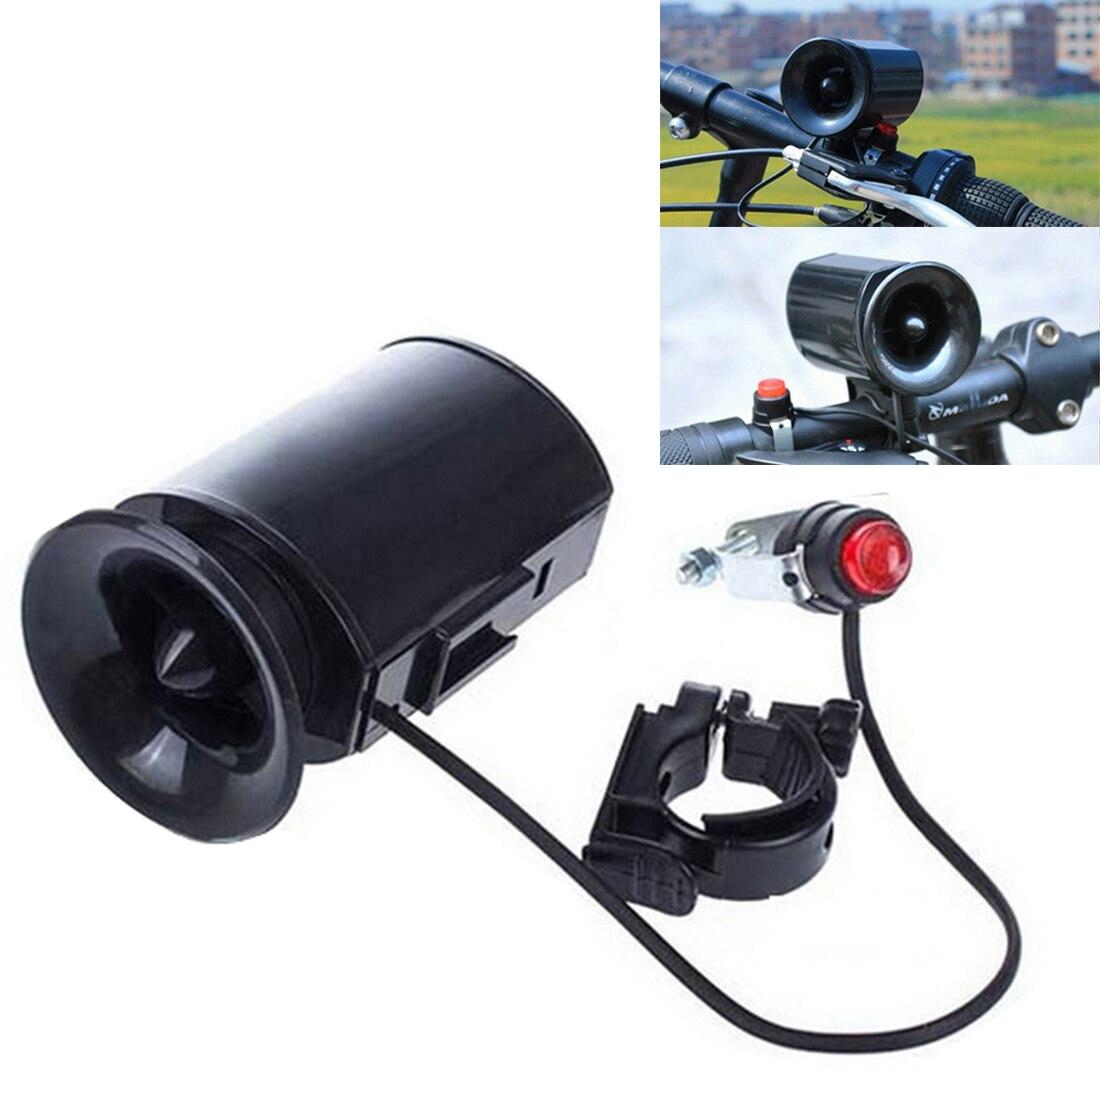 6-sound Bike Bicycle Electronic Siren Bell Horn Super-Loud Alarm Speaker x1